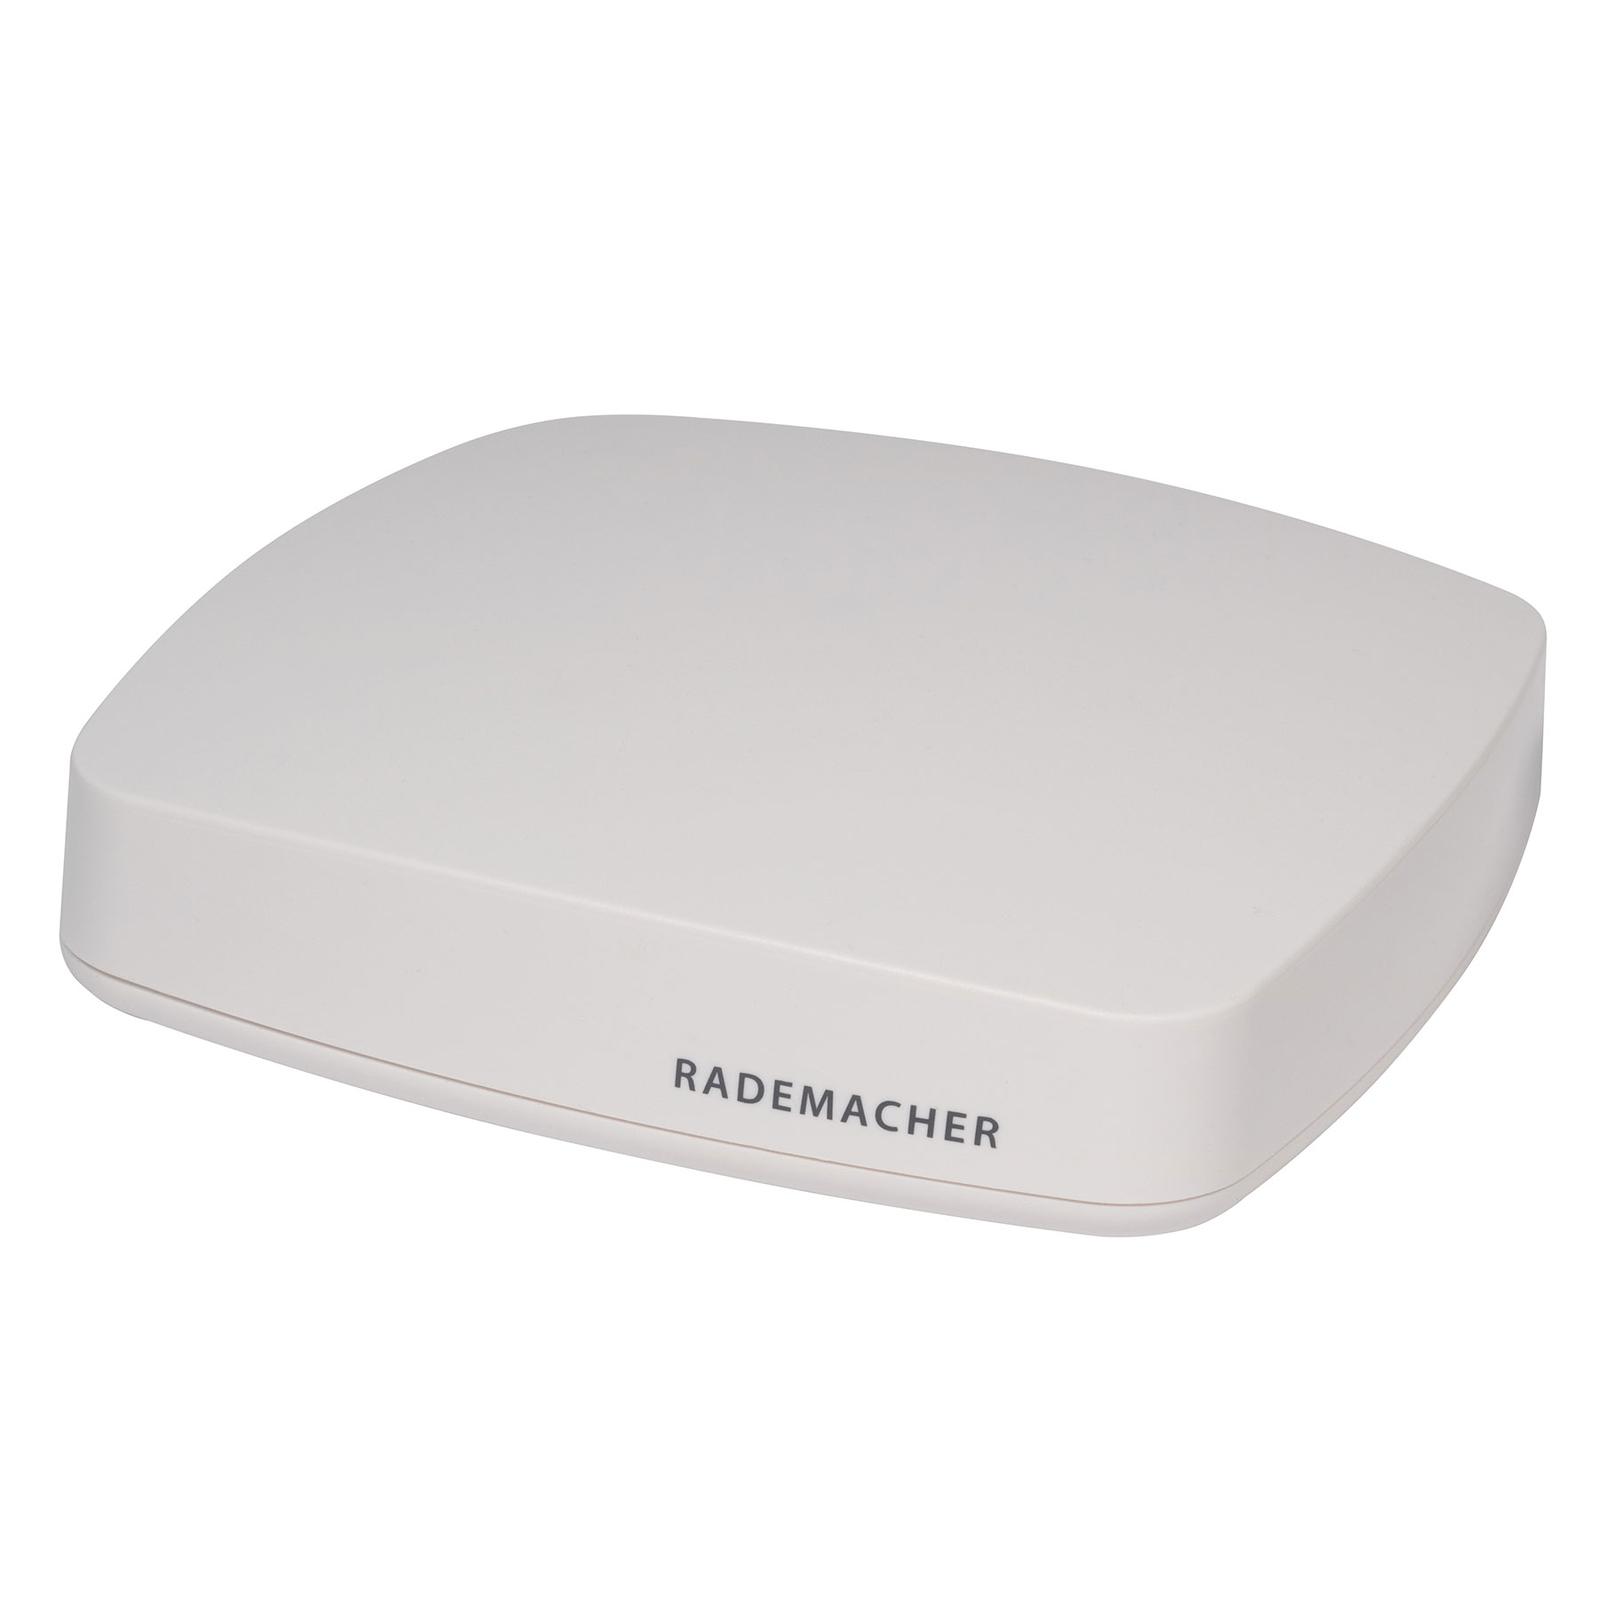 Rademacher HomePilot Smart Home ohjauskeskus